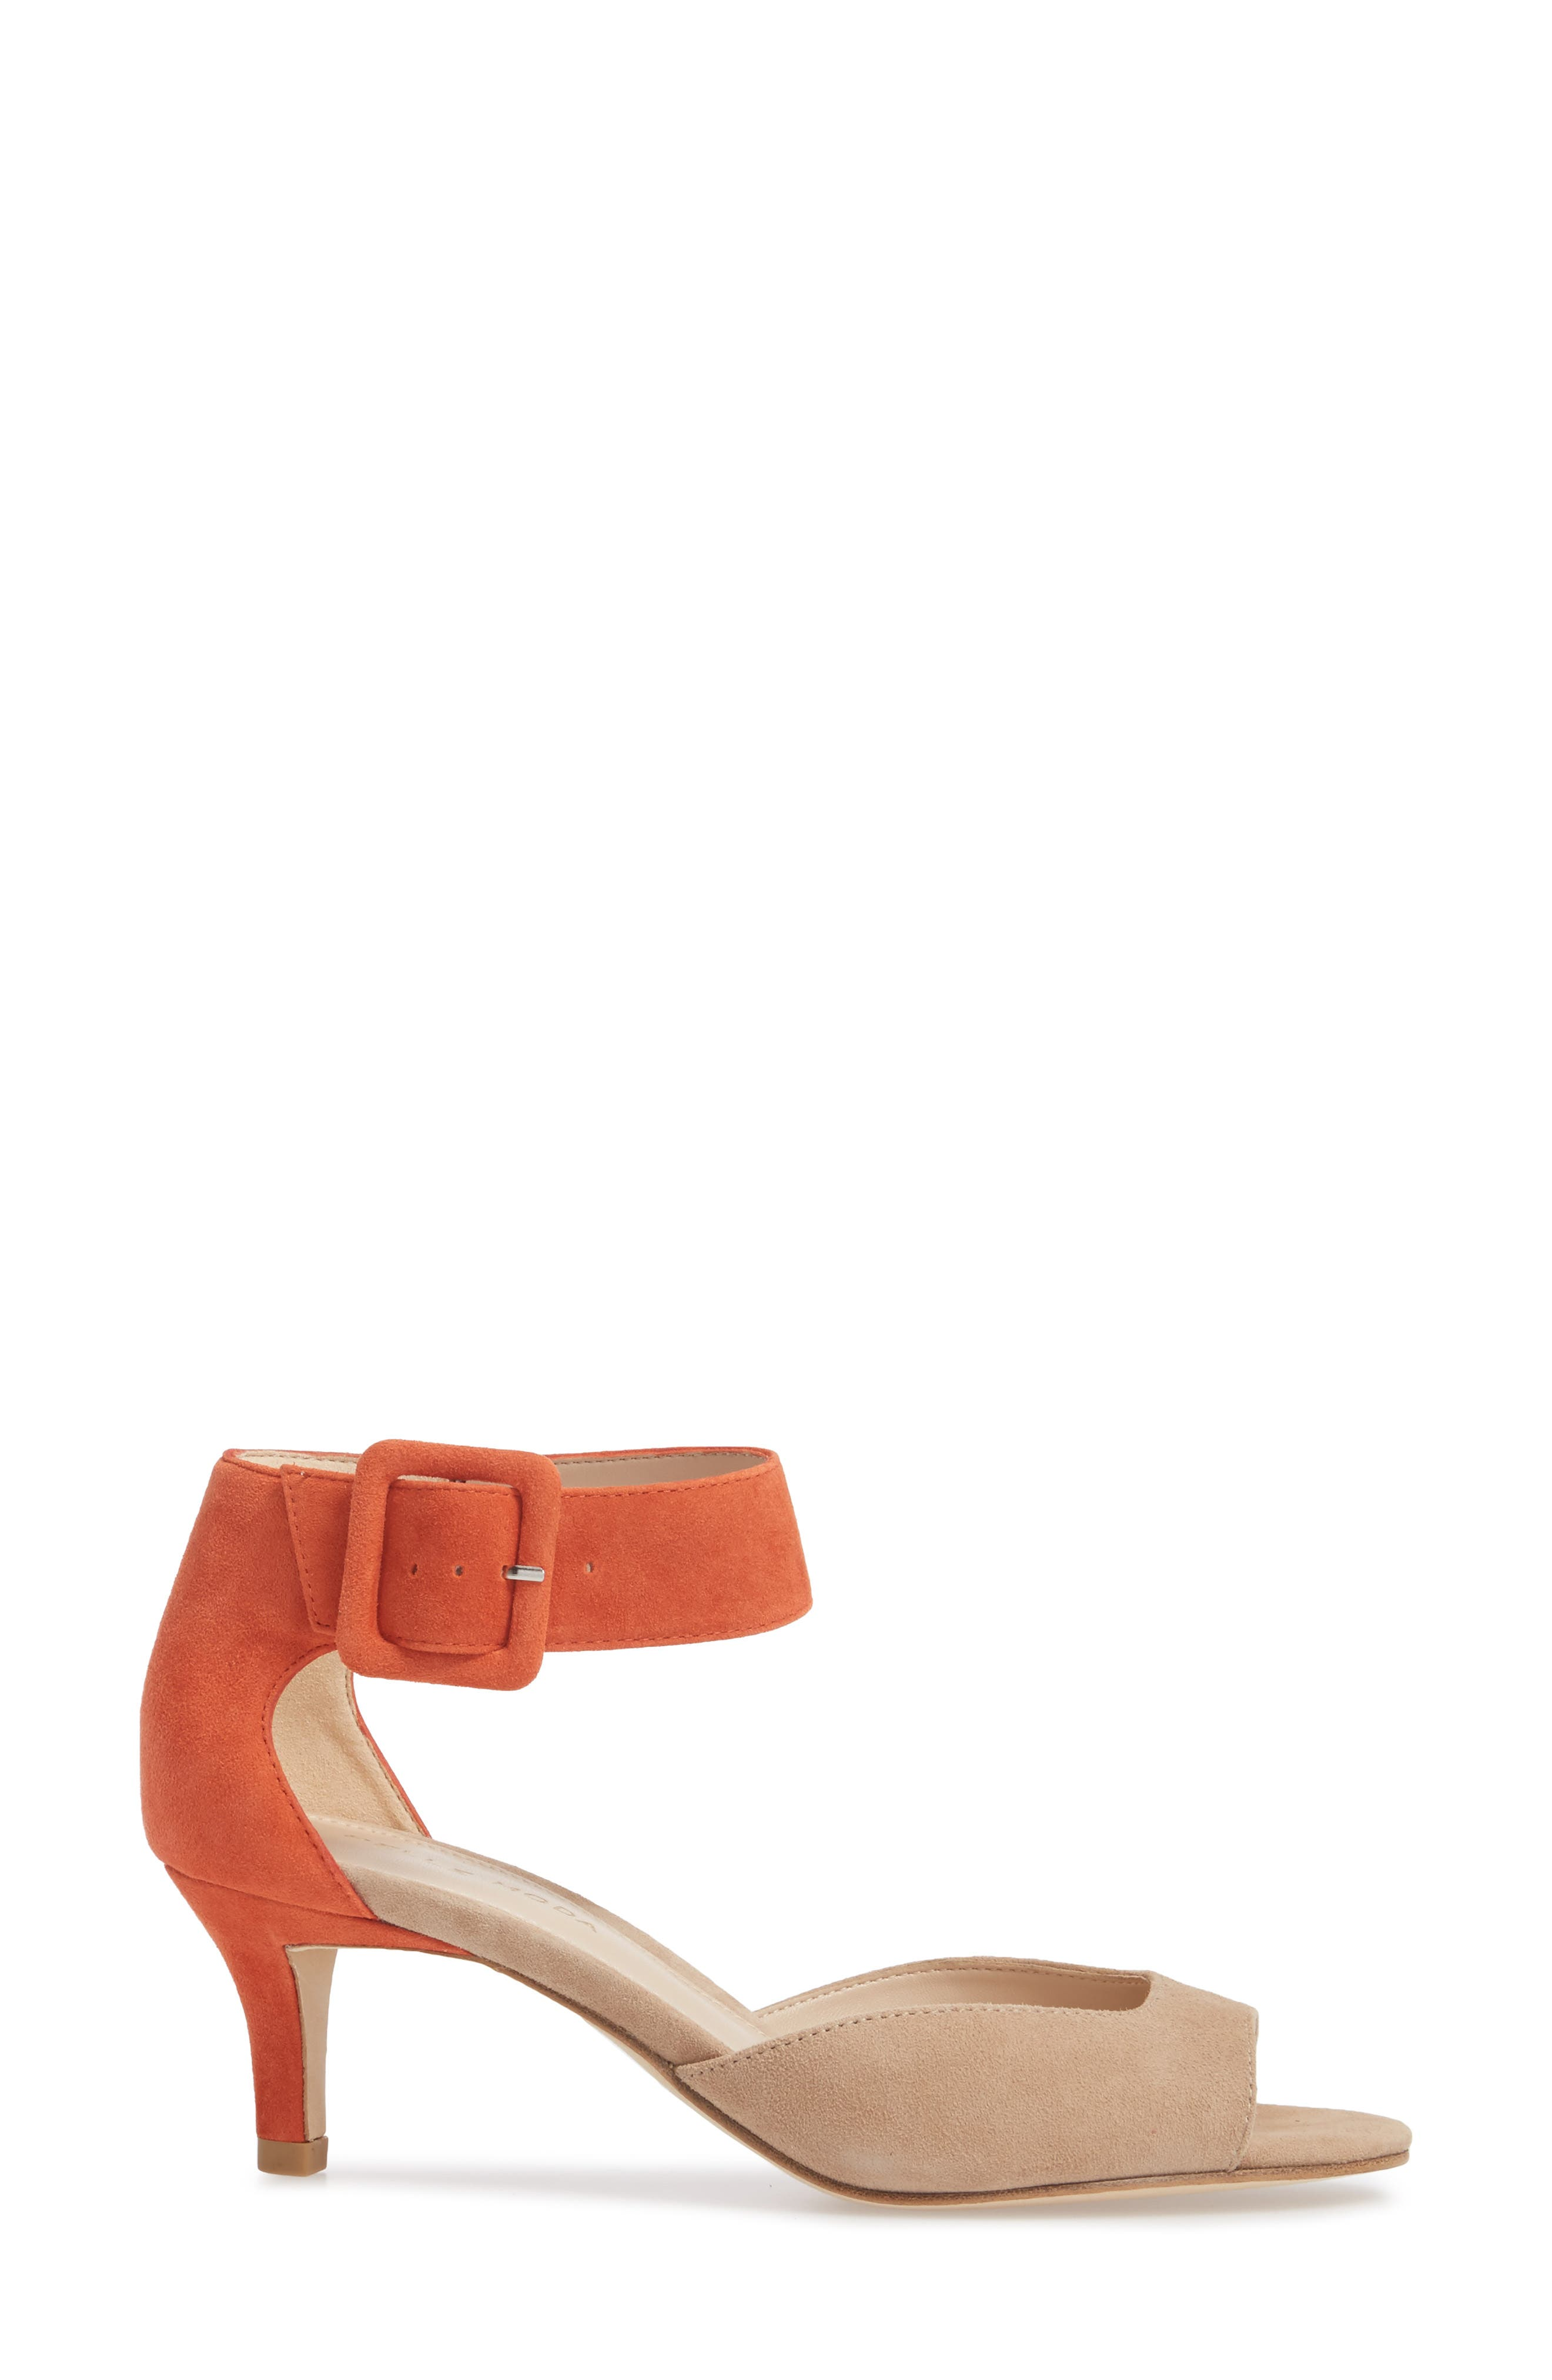 'Berlin' Ankle Strap Sandal,                             Alternate thumbnail 25, color,